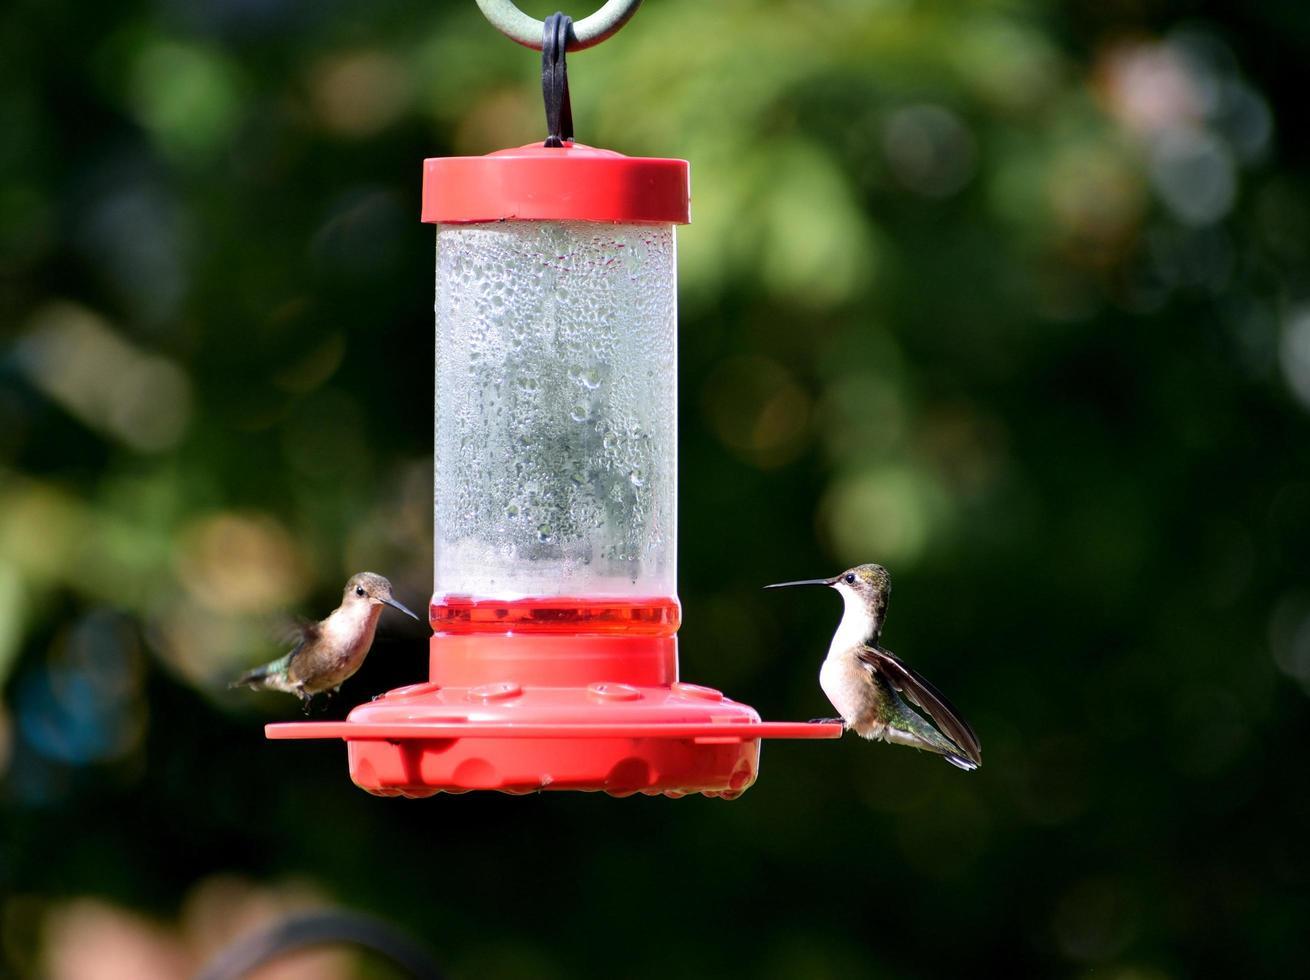 Hummingbirds at the feeder photo